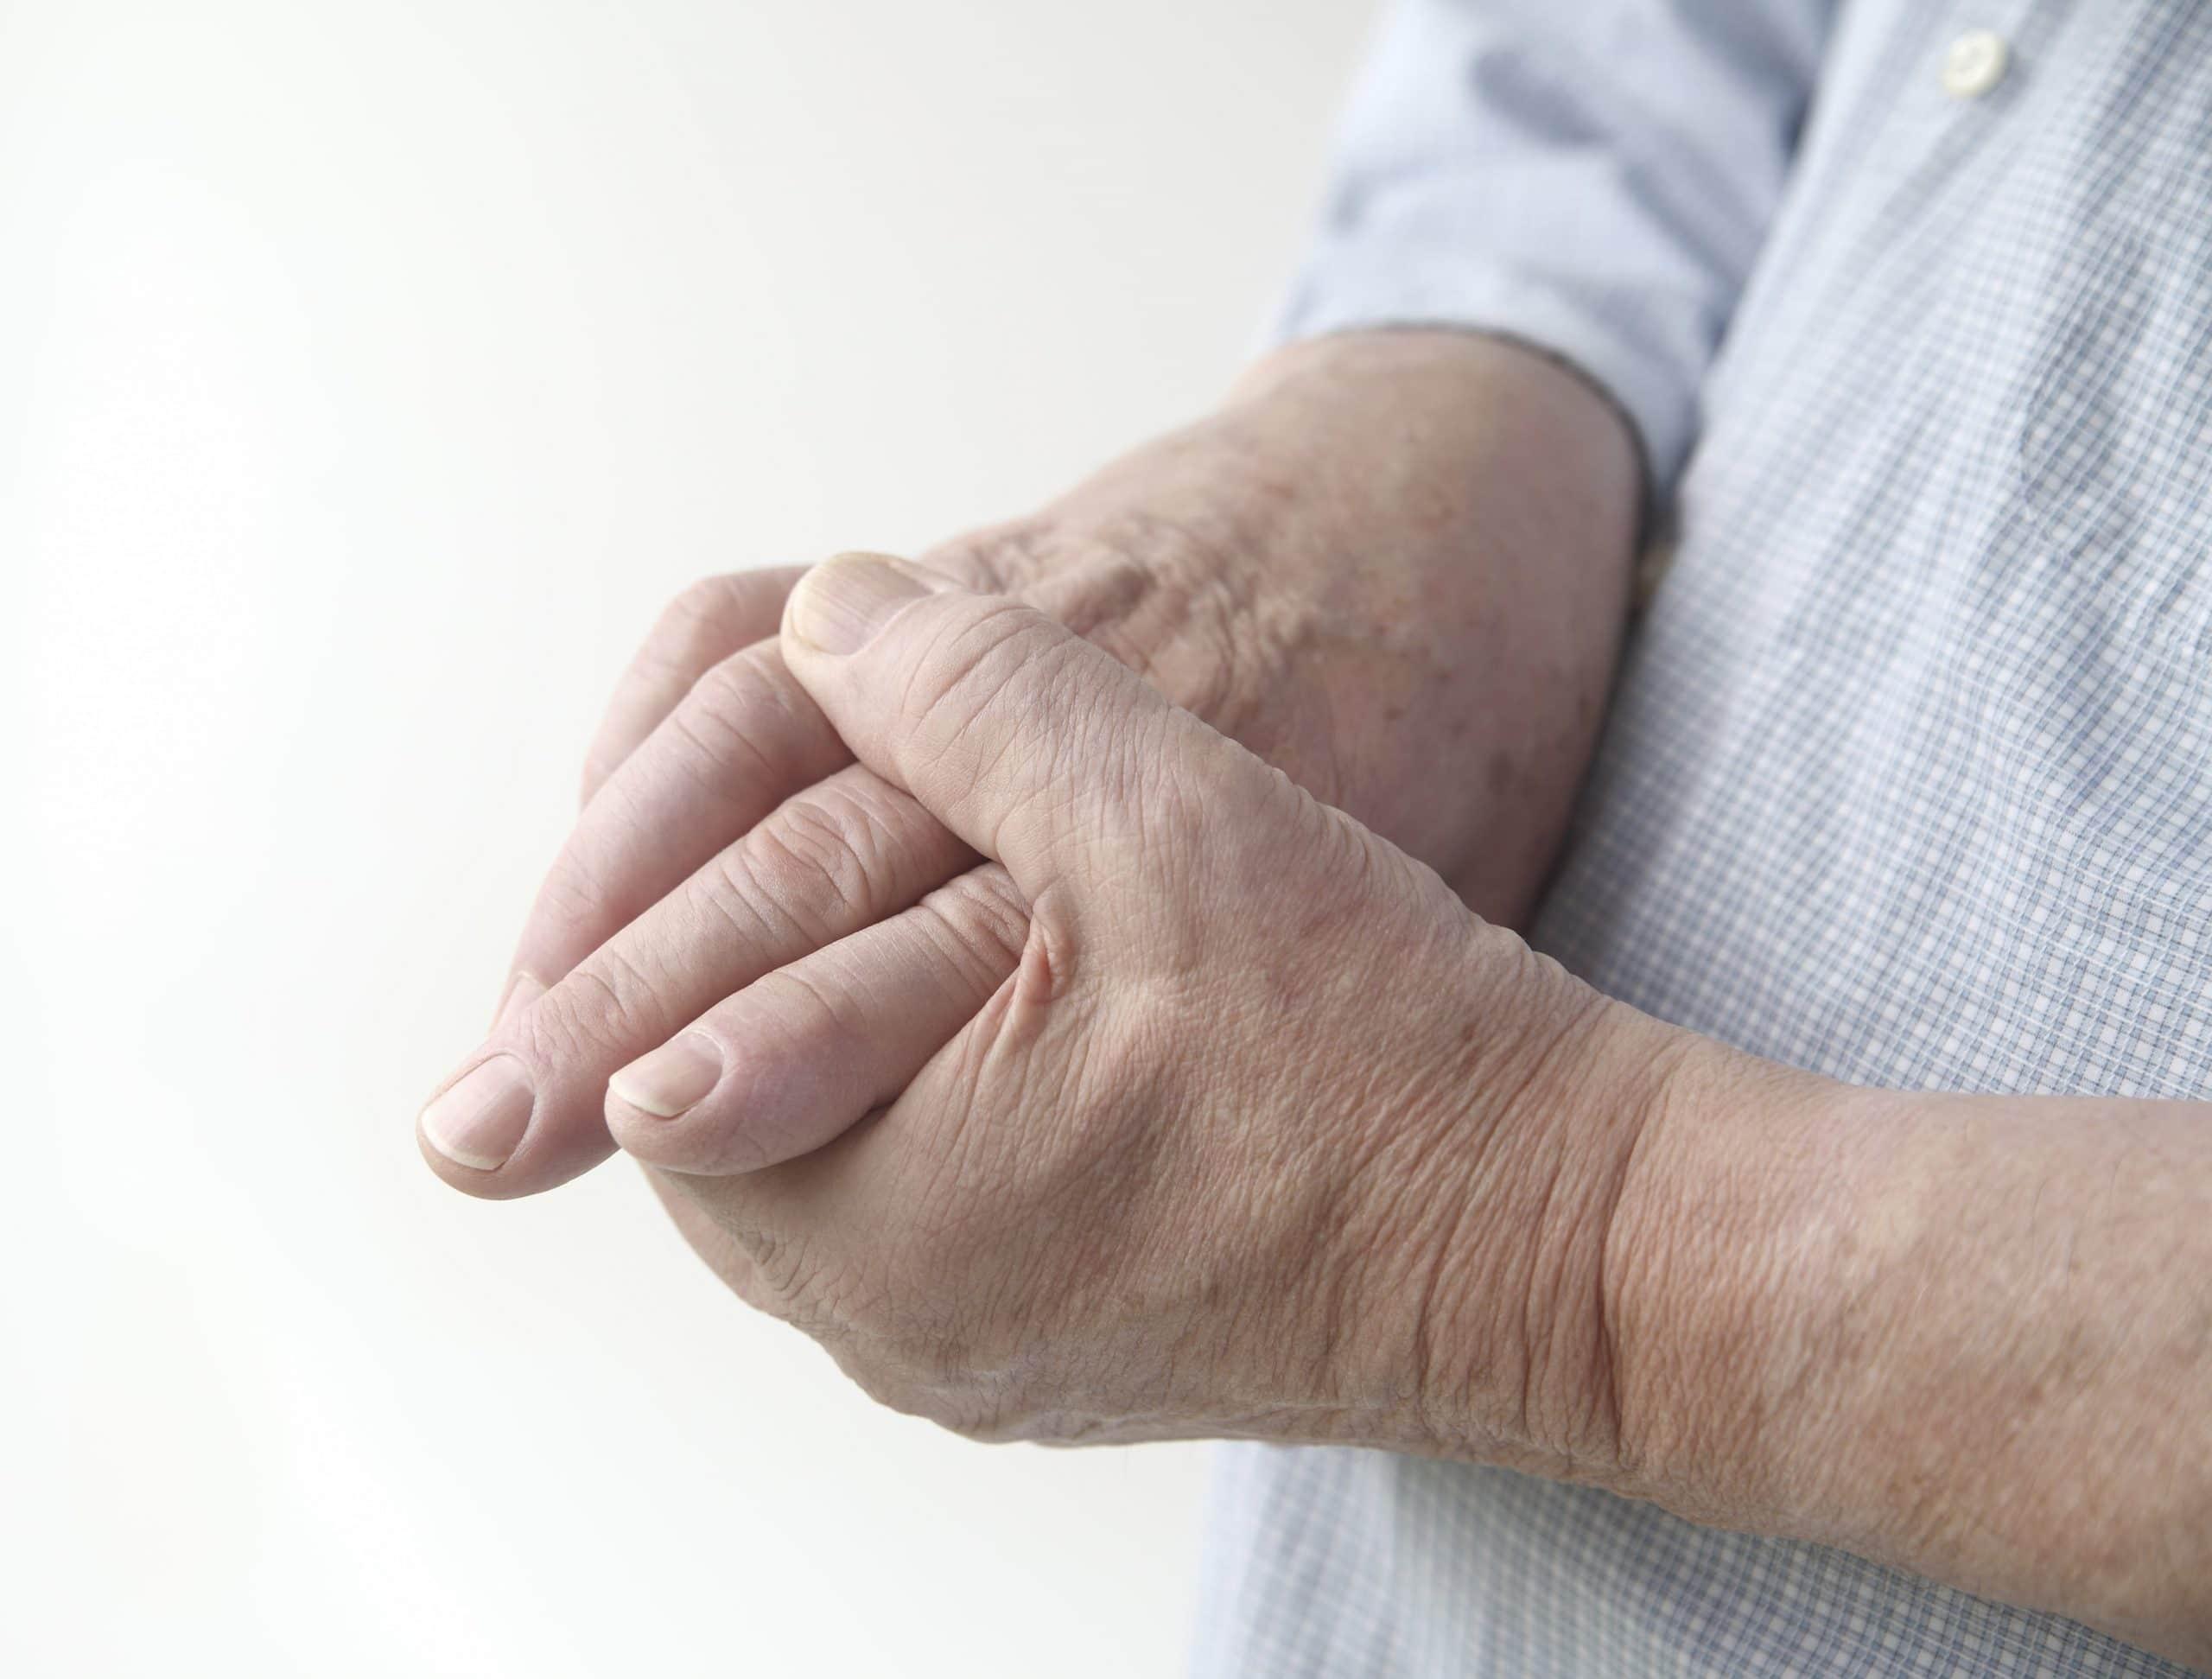 Pfizer's PRECISION: Arthritis Study Results